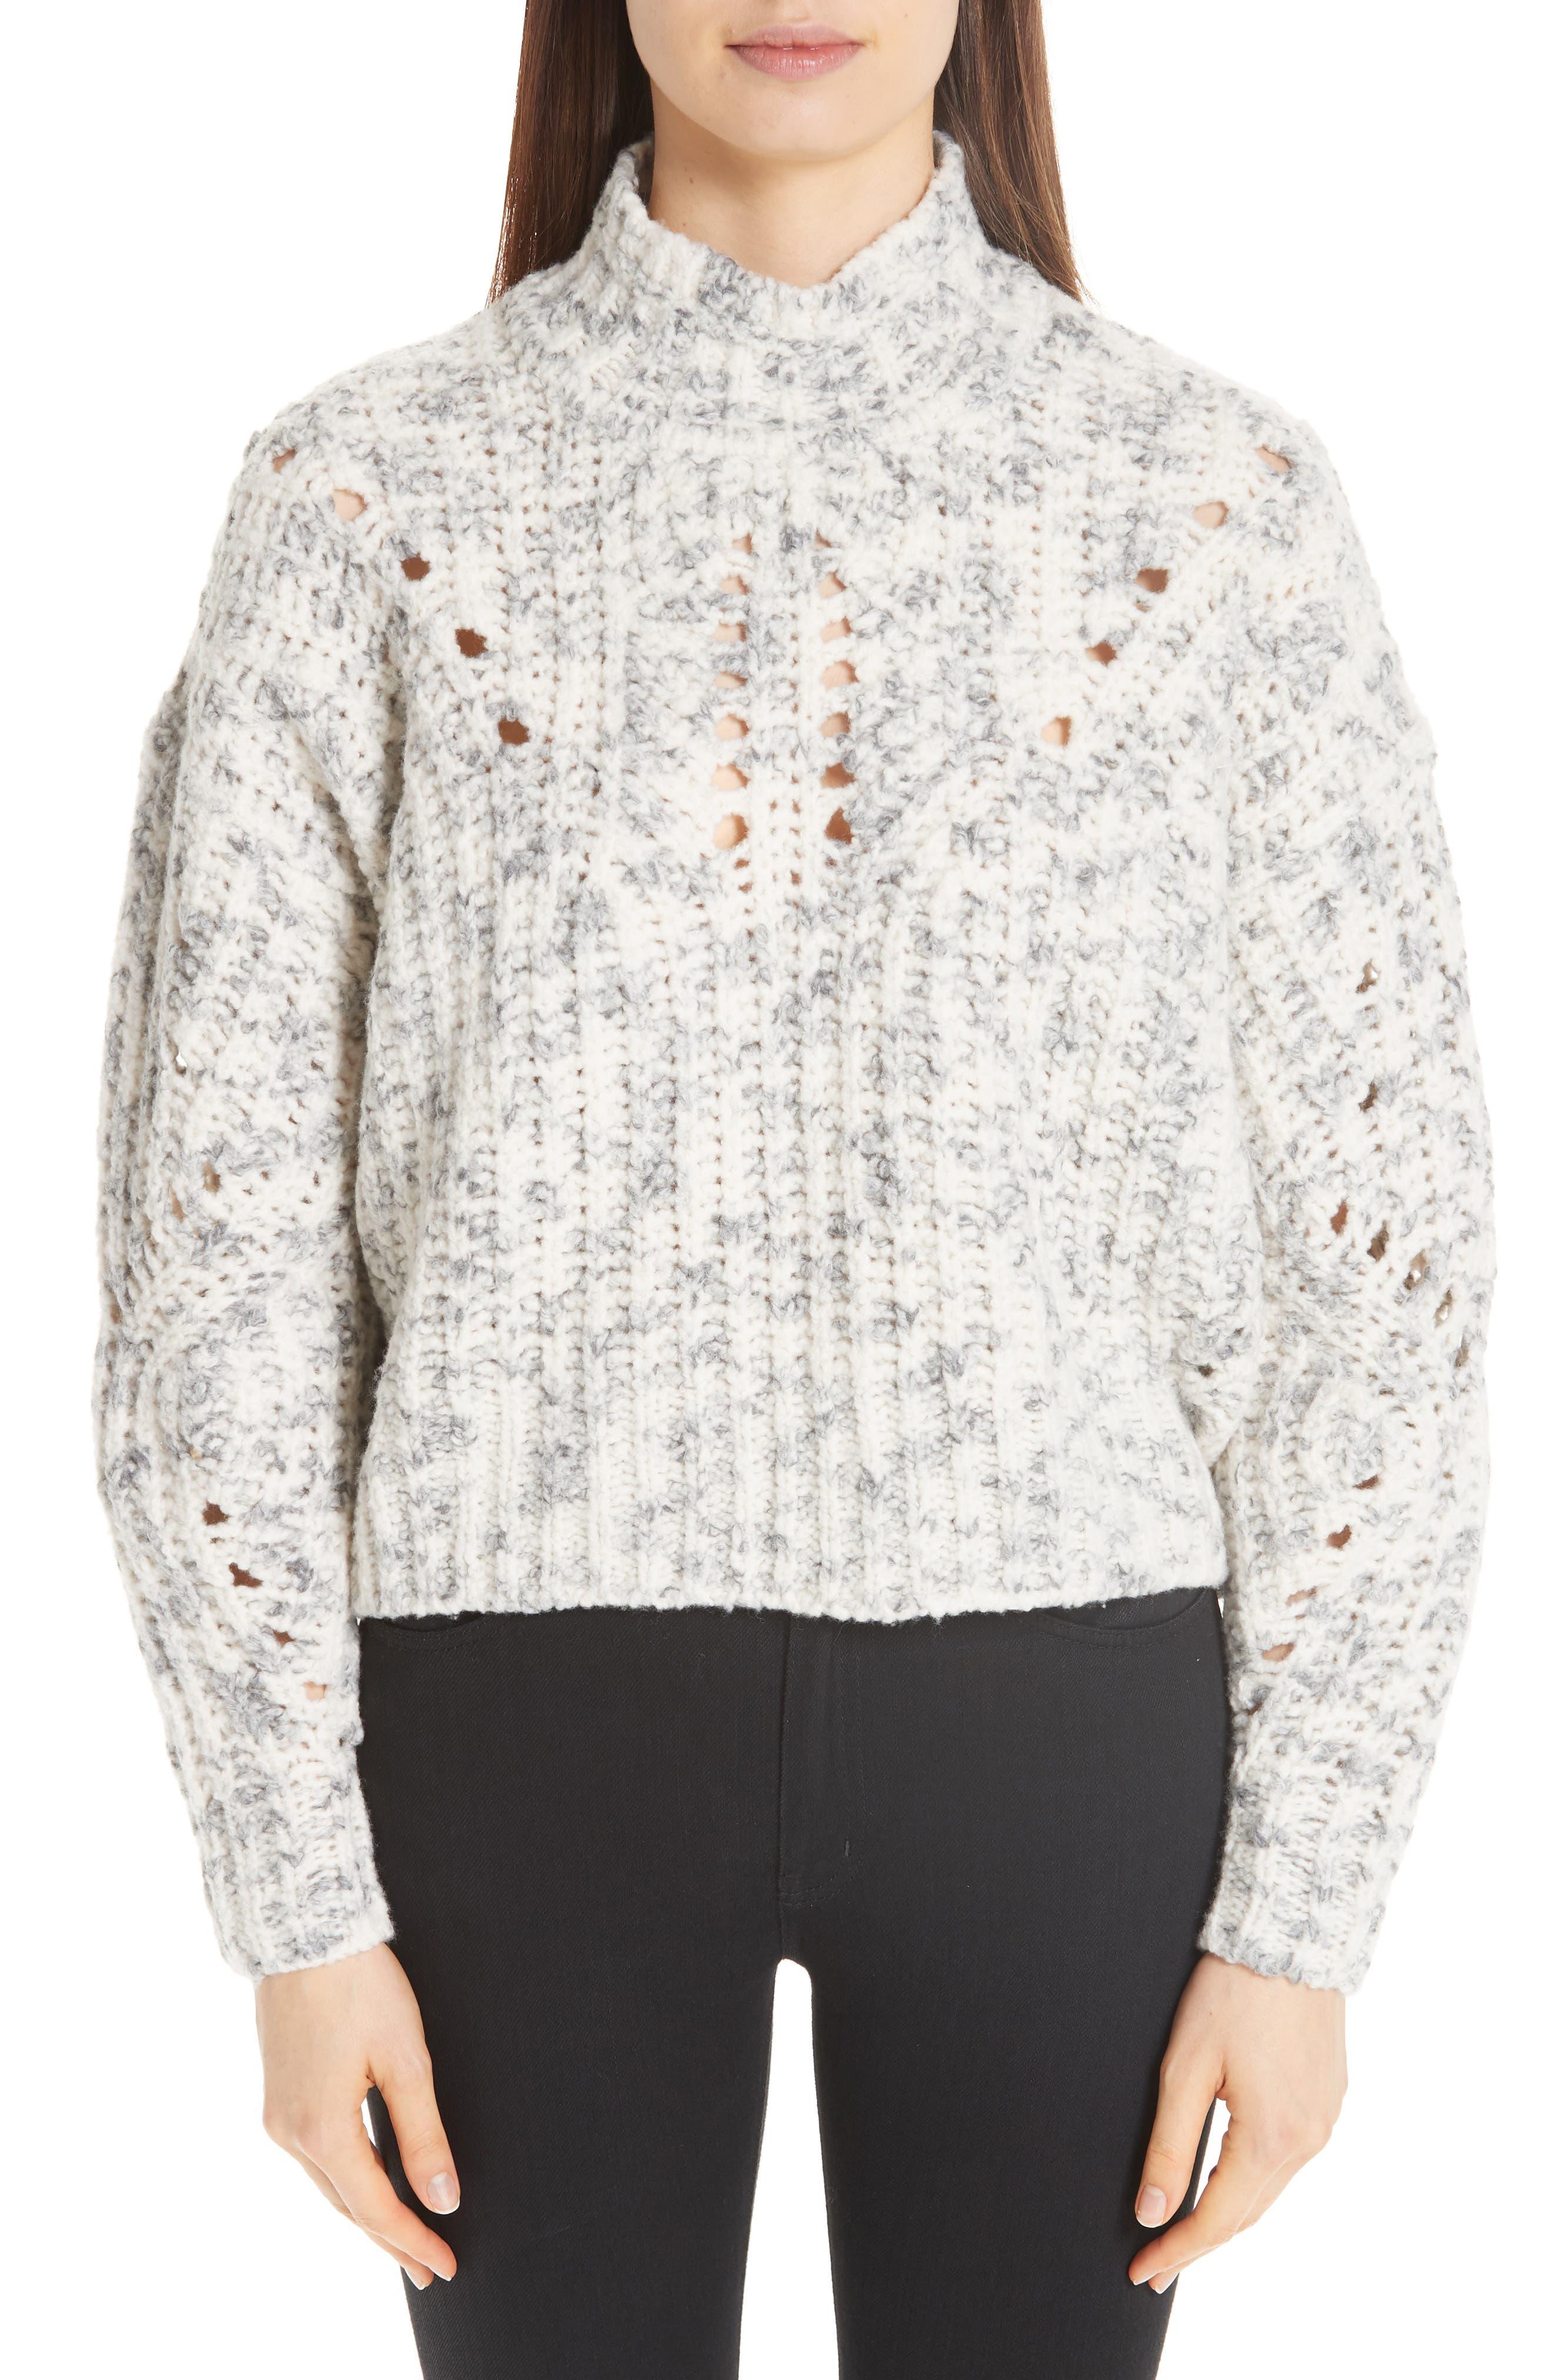 Jilly Wool Sweater,                             Main thumbnail 1, color,                             900